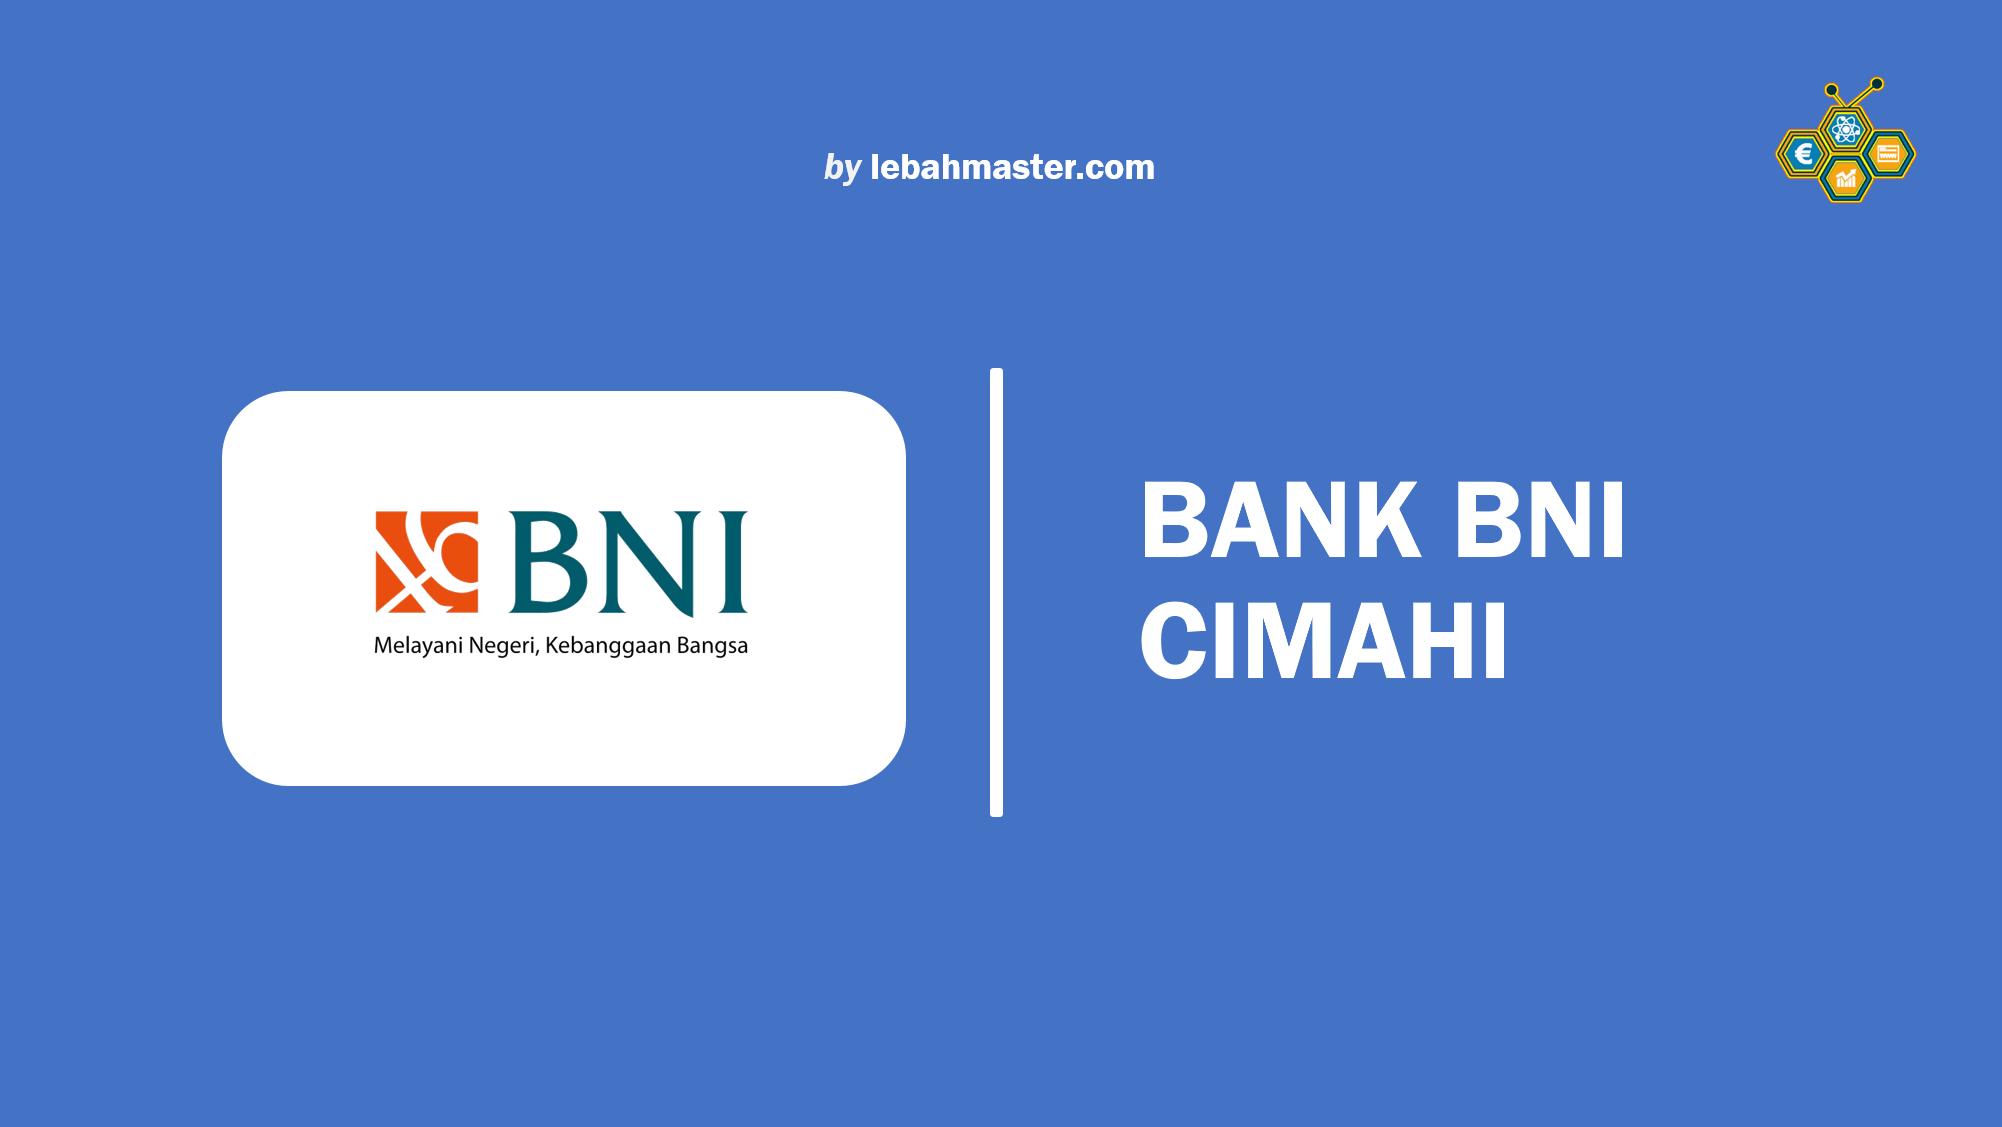 Bank BNI Cimahi